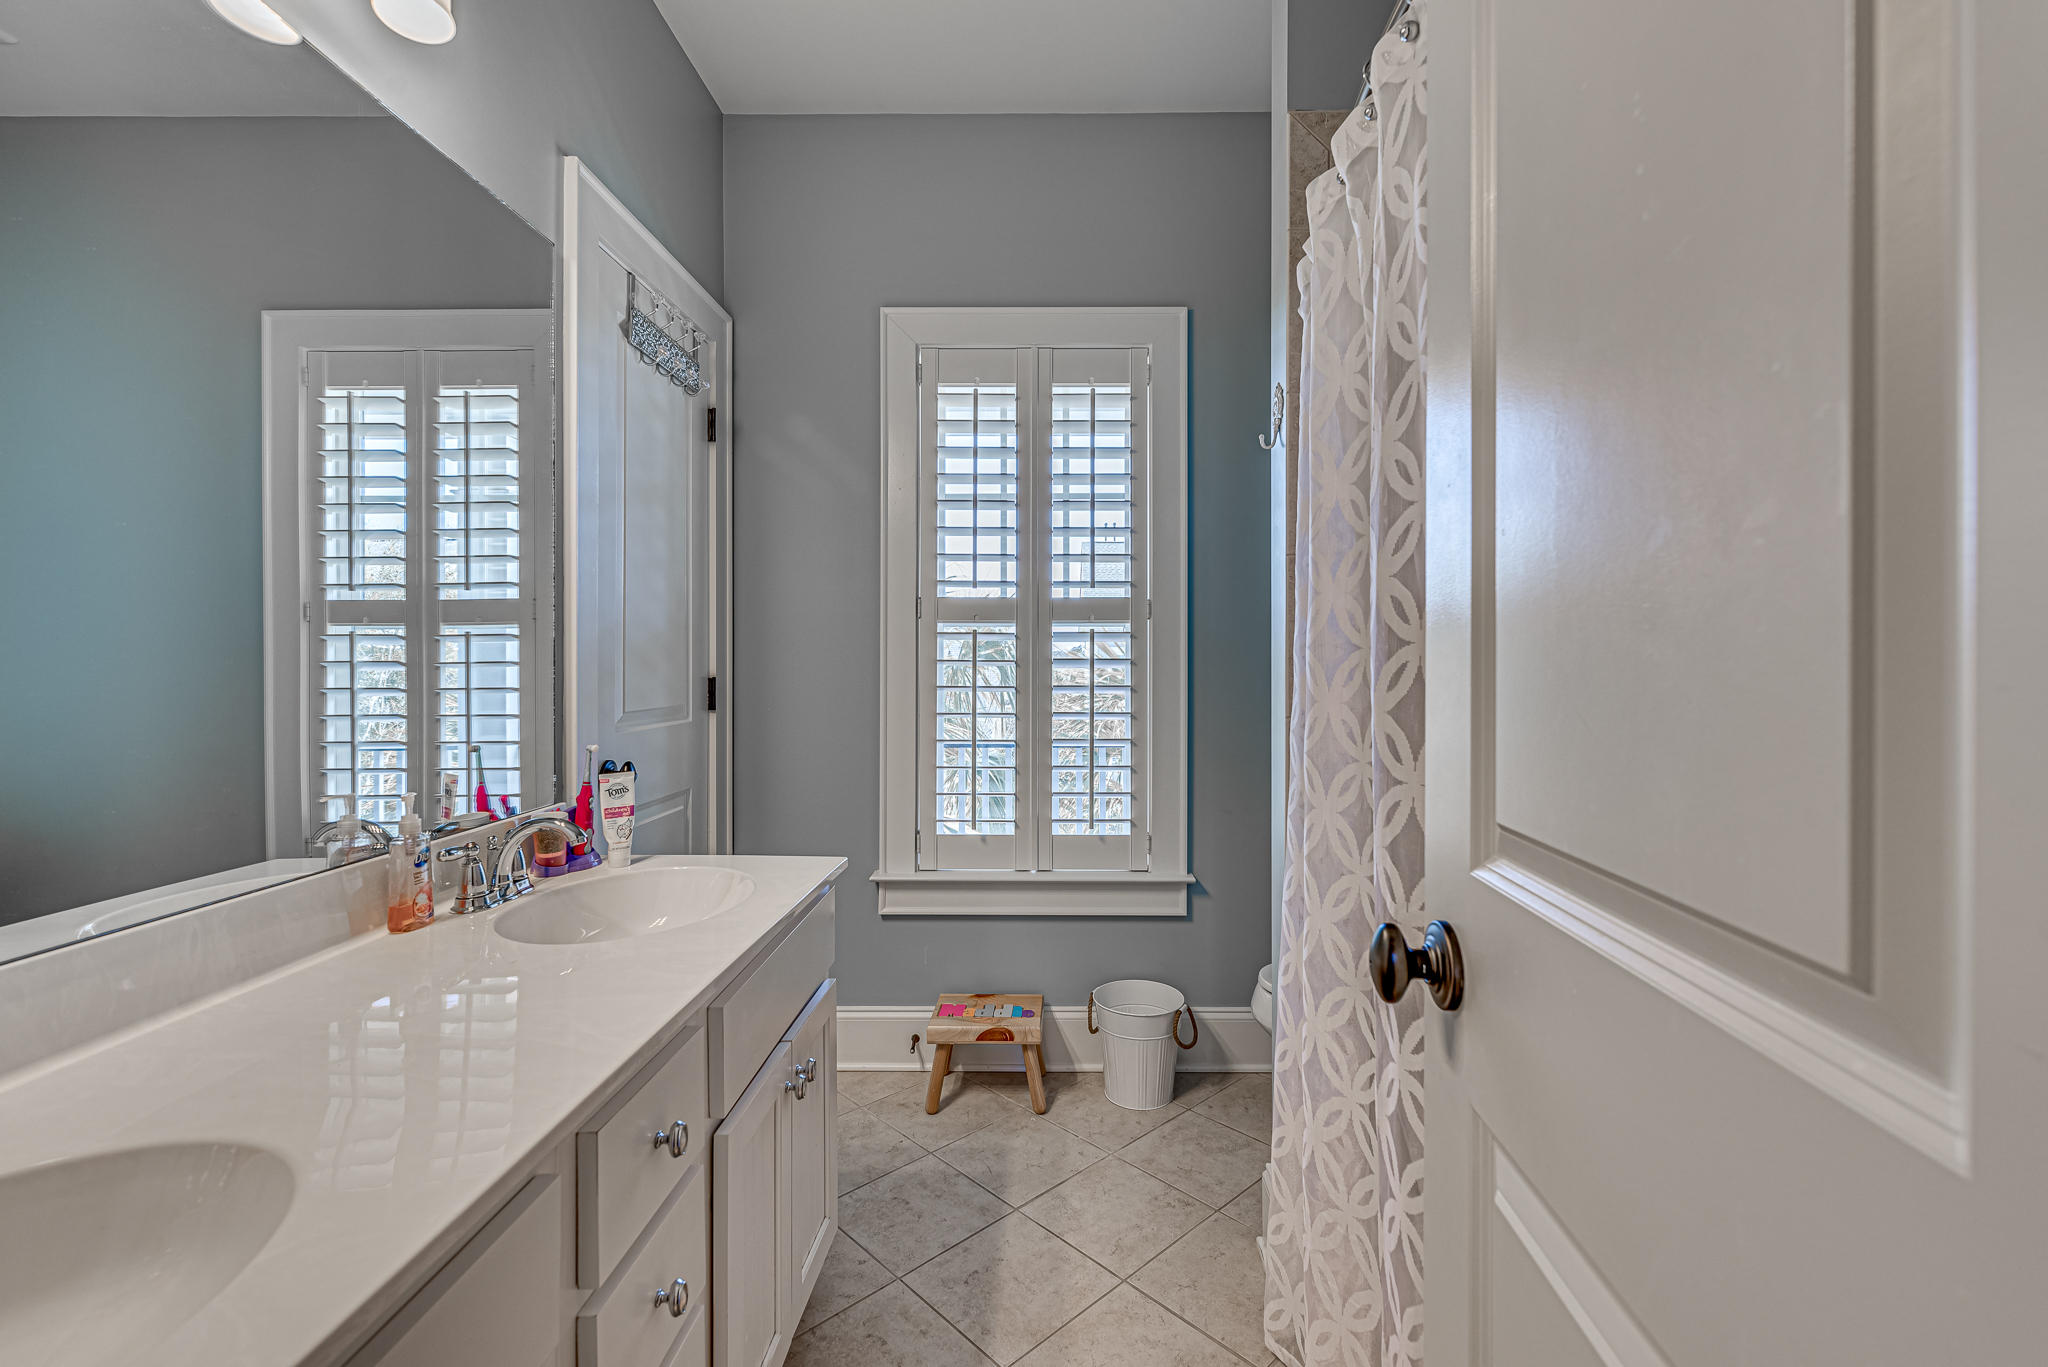 Daniel Island Smythe Park Homes For Sale - 1410 Wando View, Charleston, SC - 51